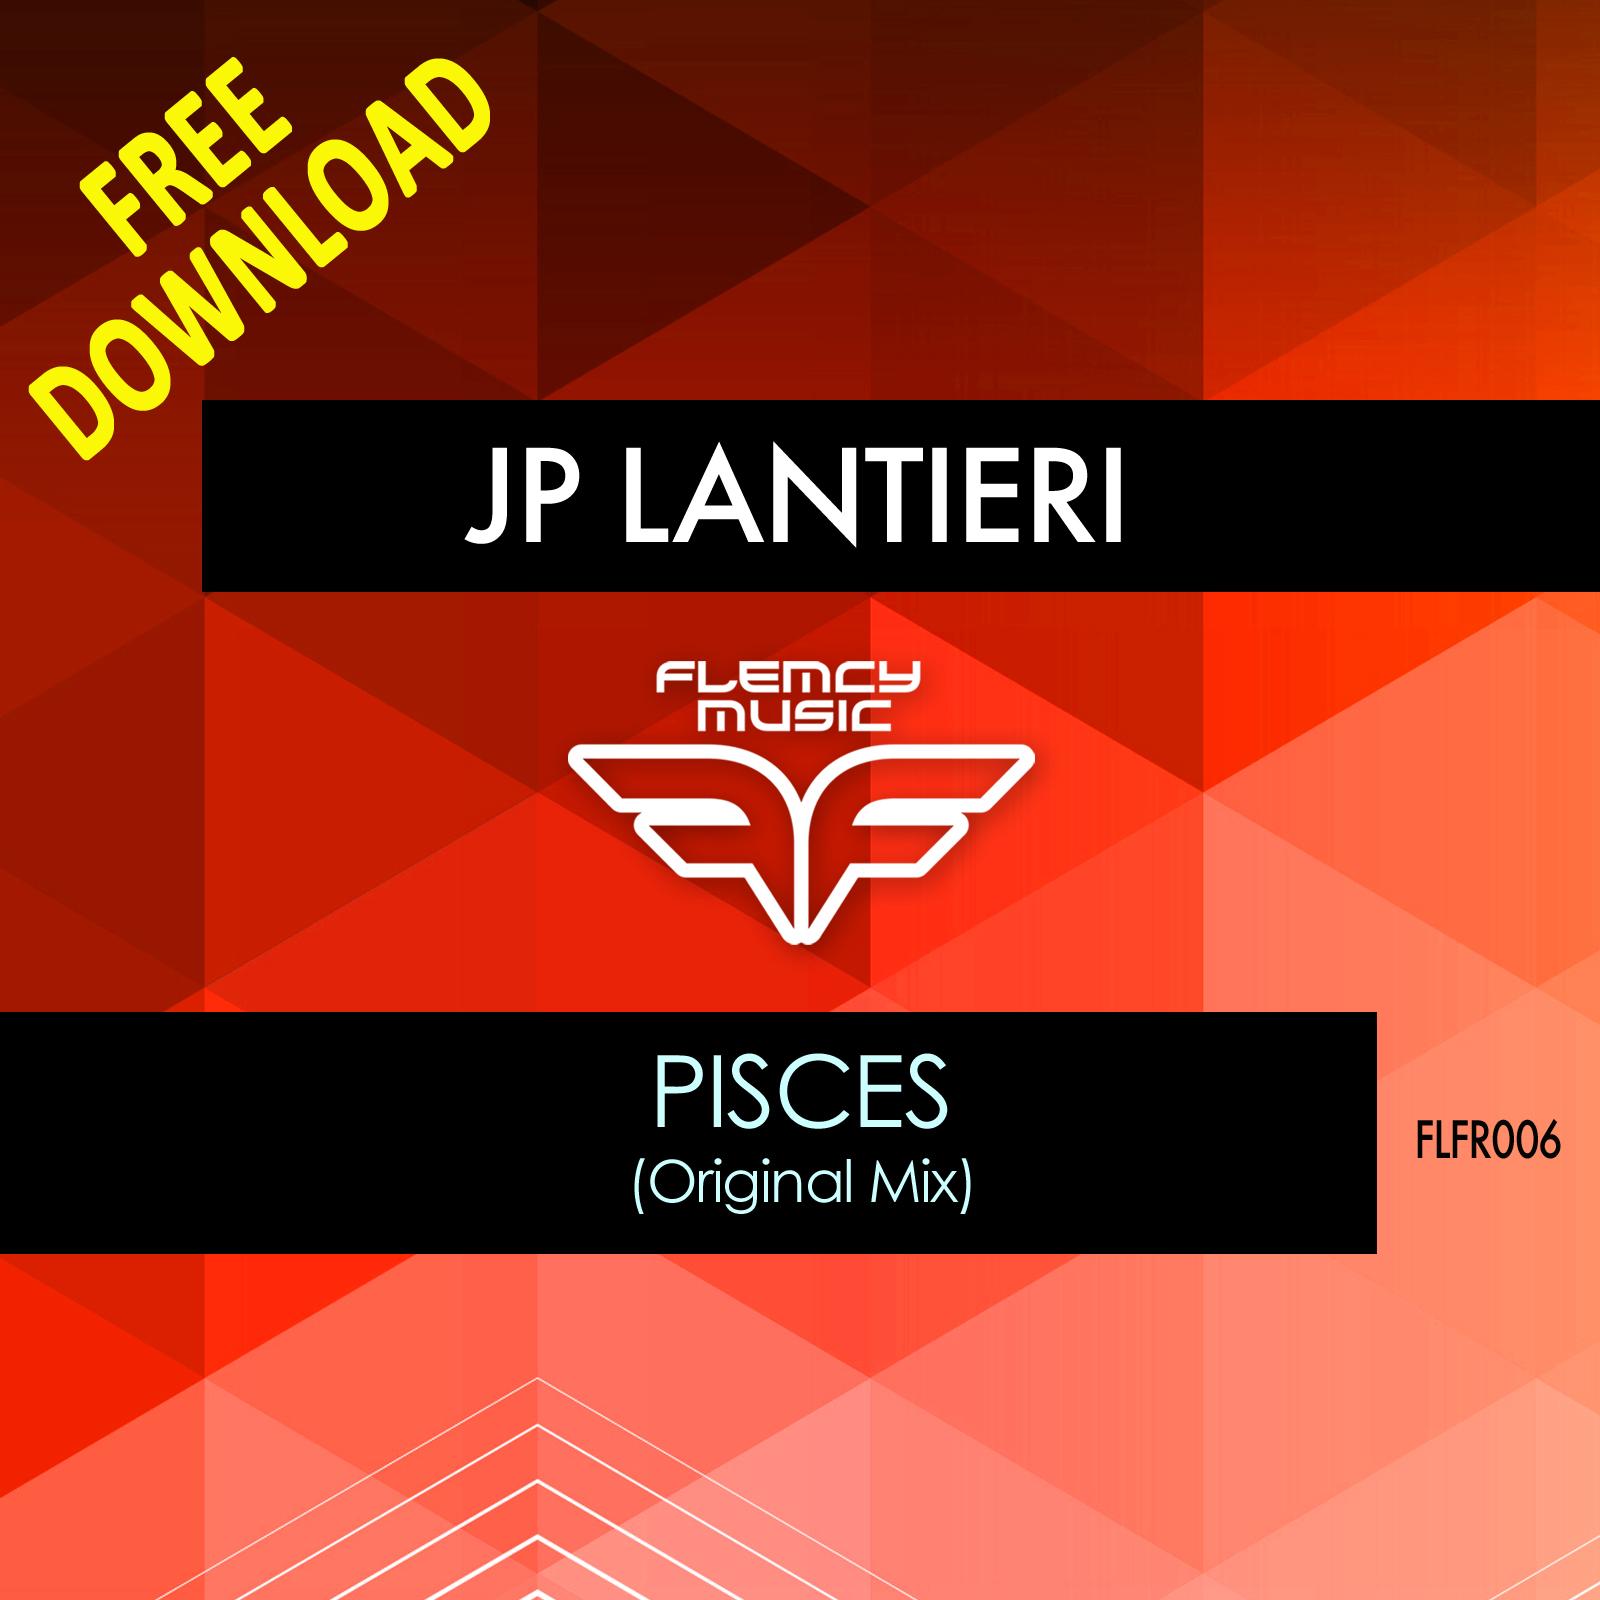 Flemcy Music JP LANTIERI Pisces Free Download